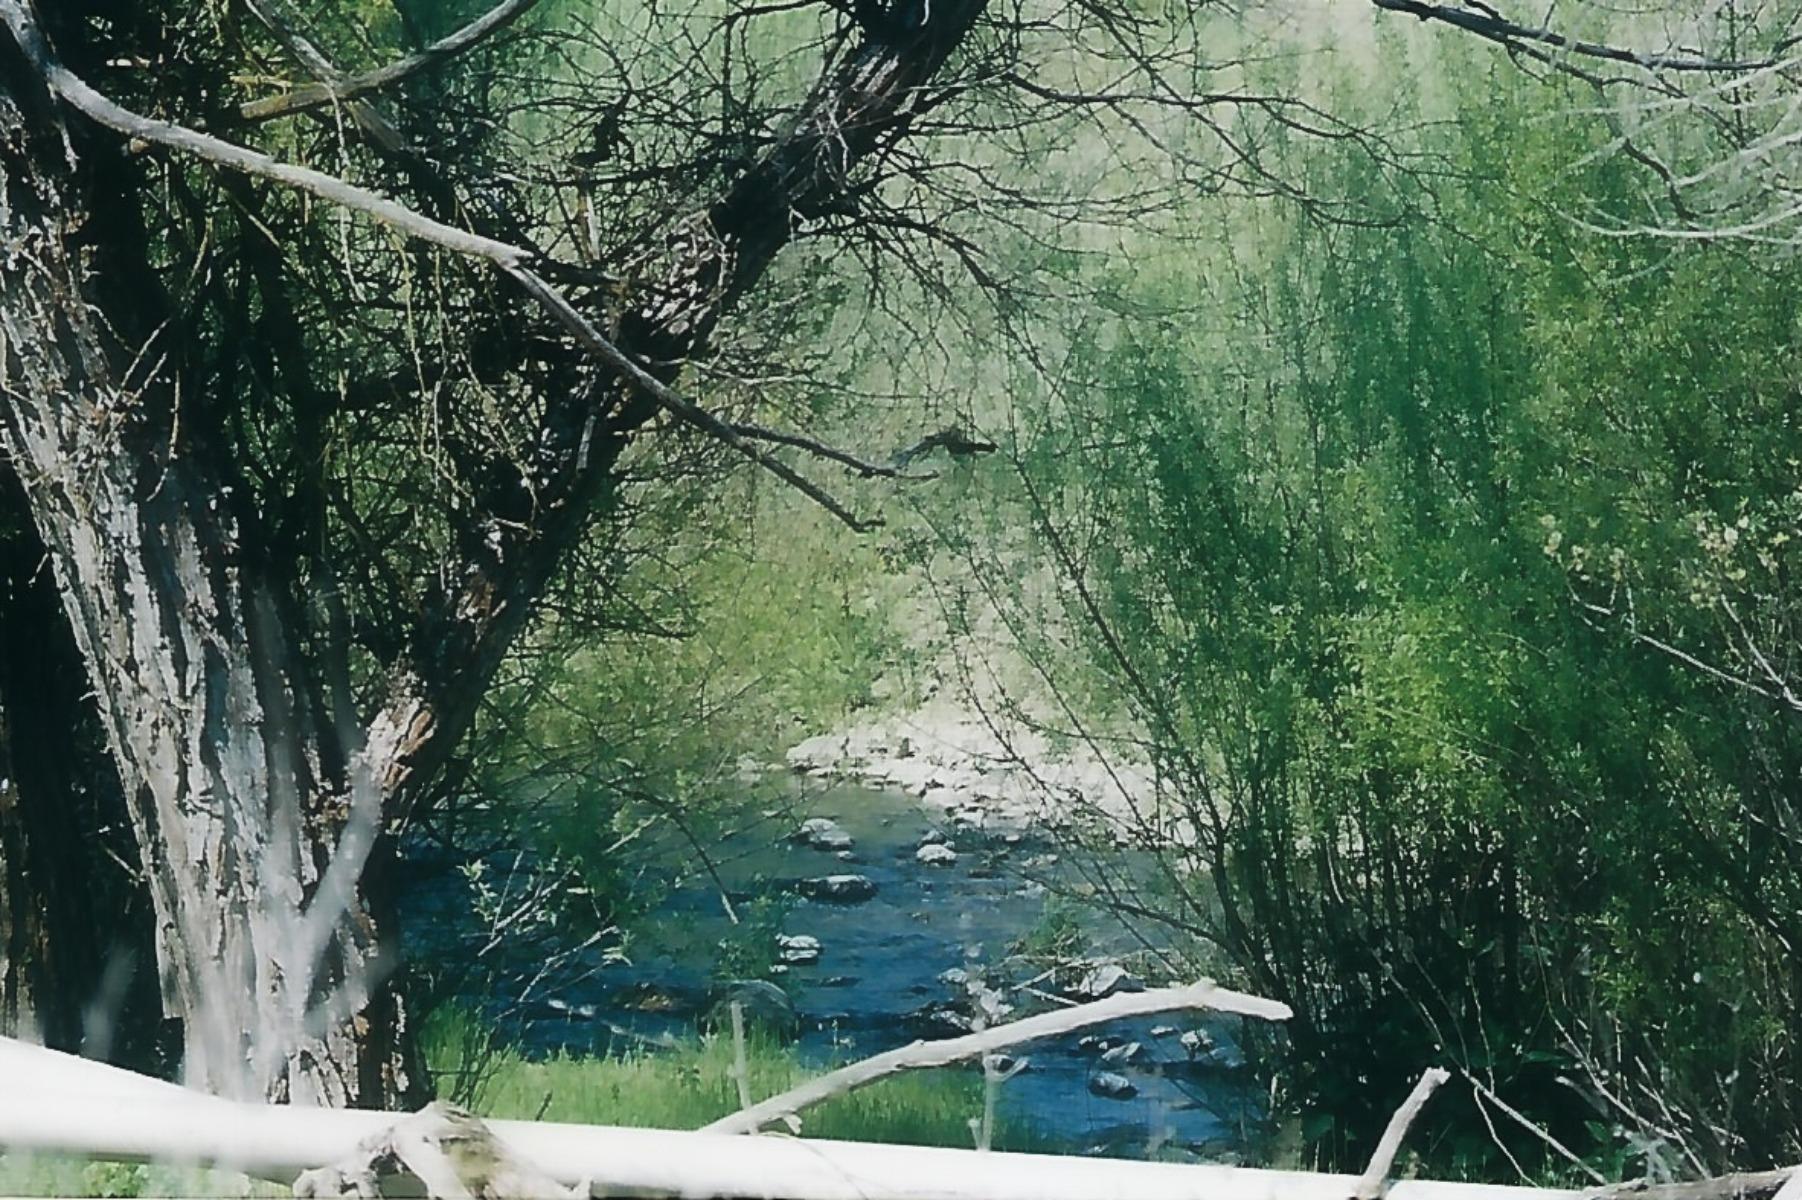 Crawford creekview.jpg